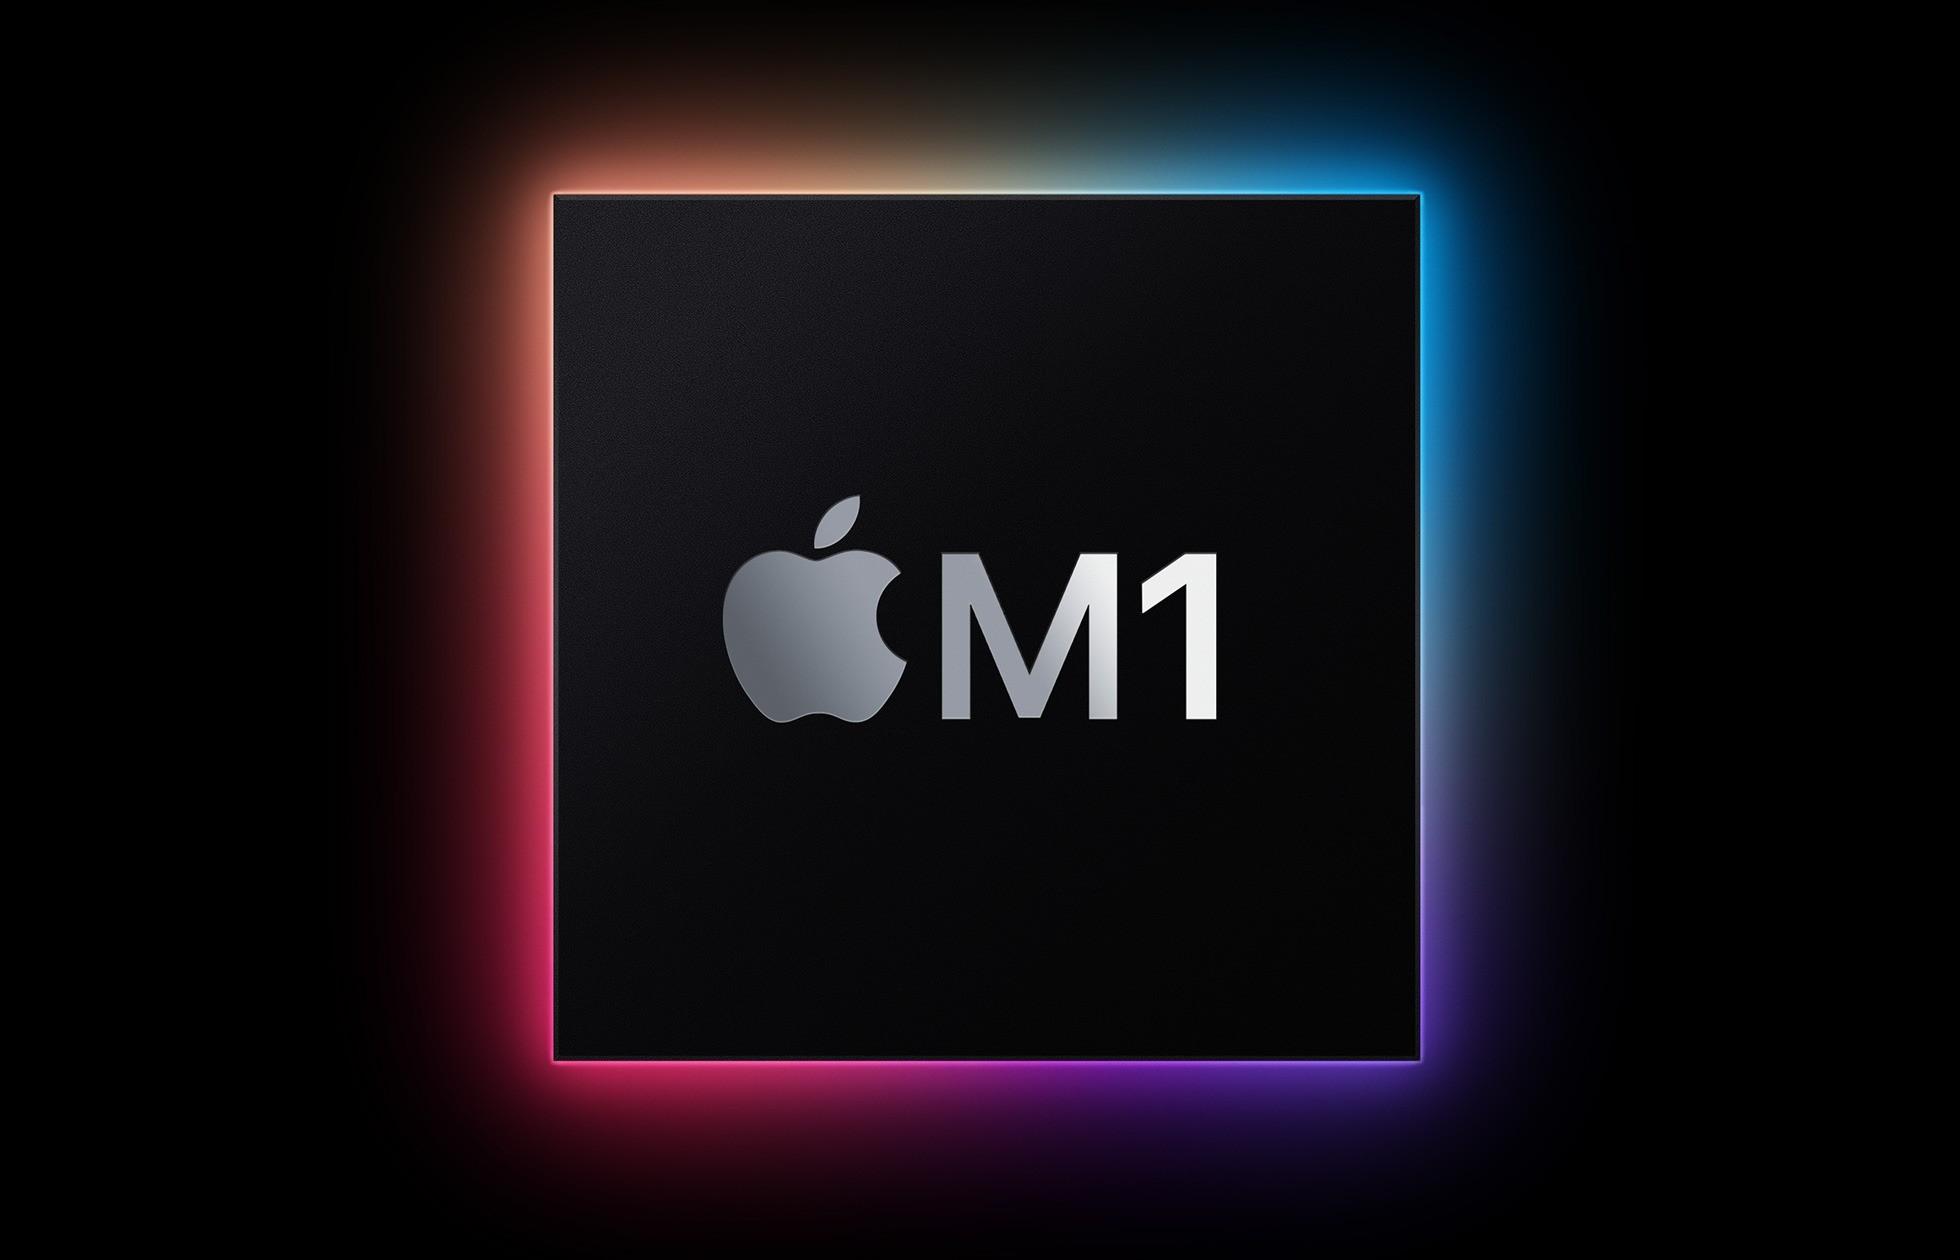 Apple is gunning for Intel in the desktop processor space